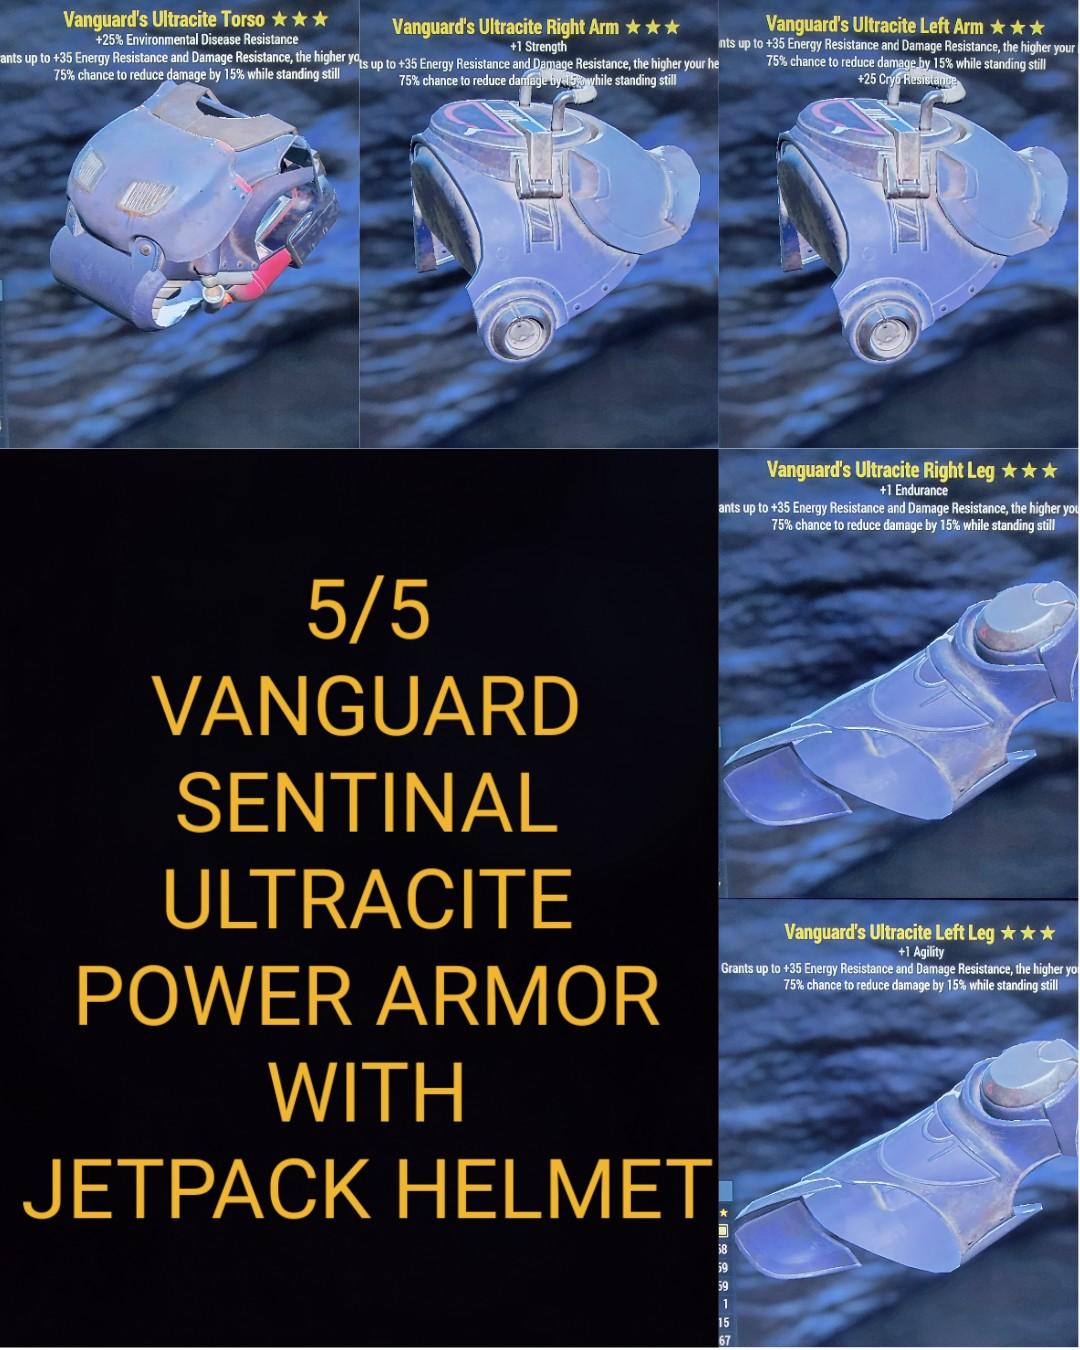 Vanguard Sentinal Ultracite Power Armor Set With Jetpack Helmet